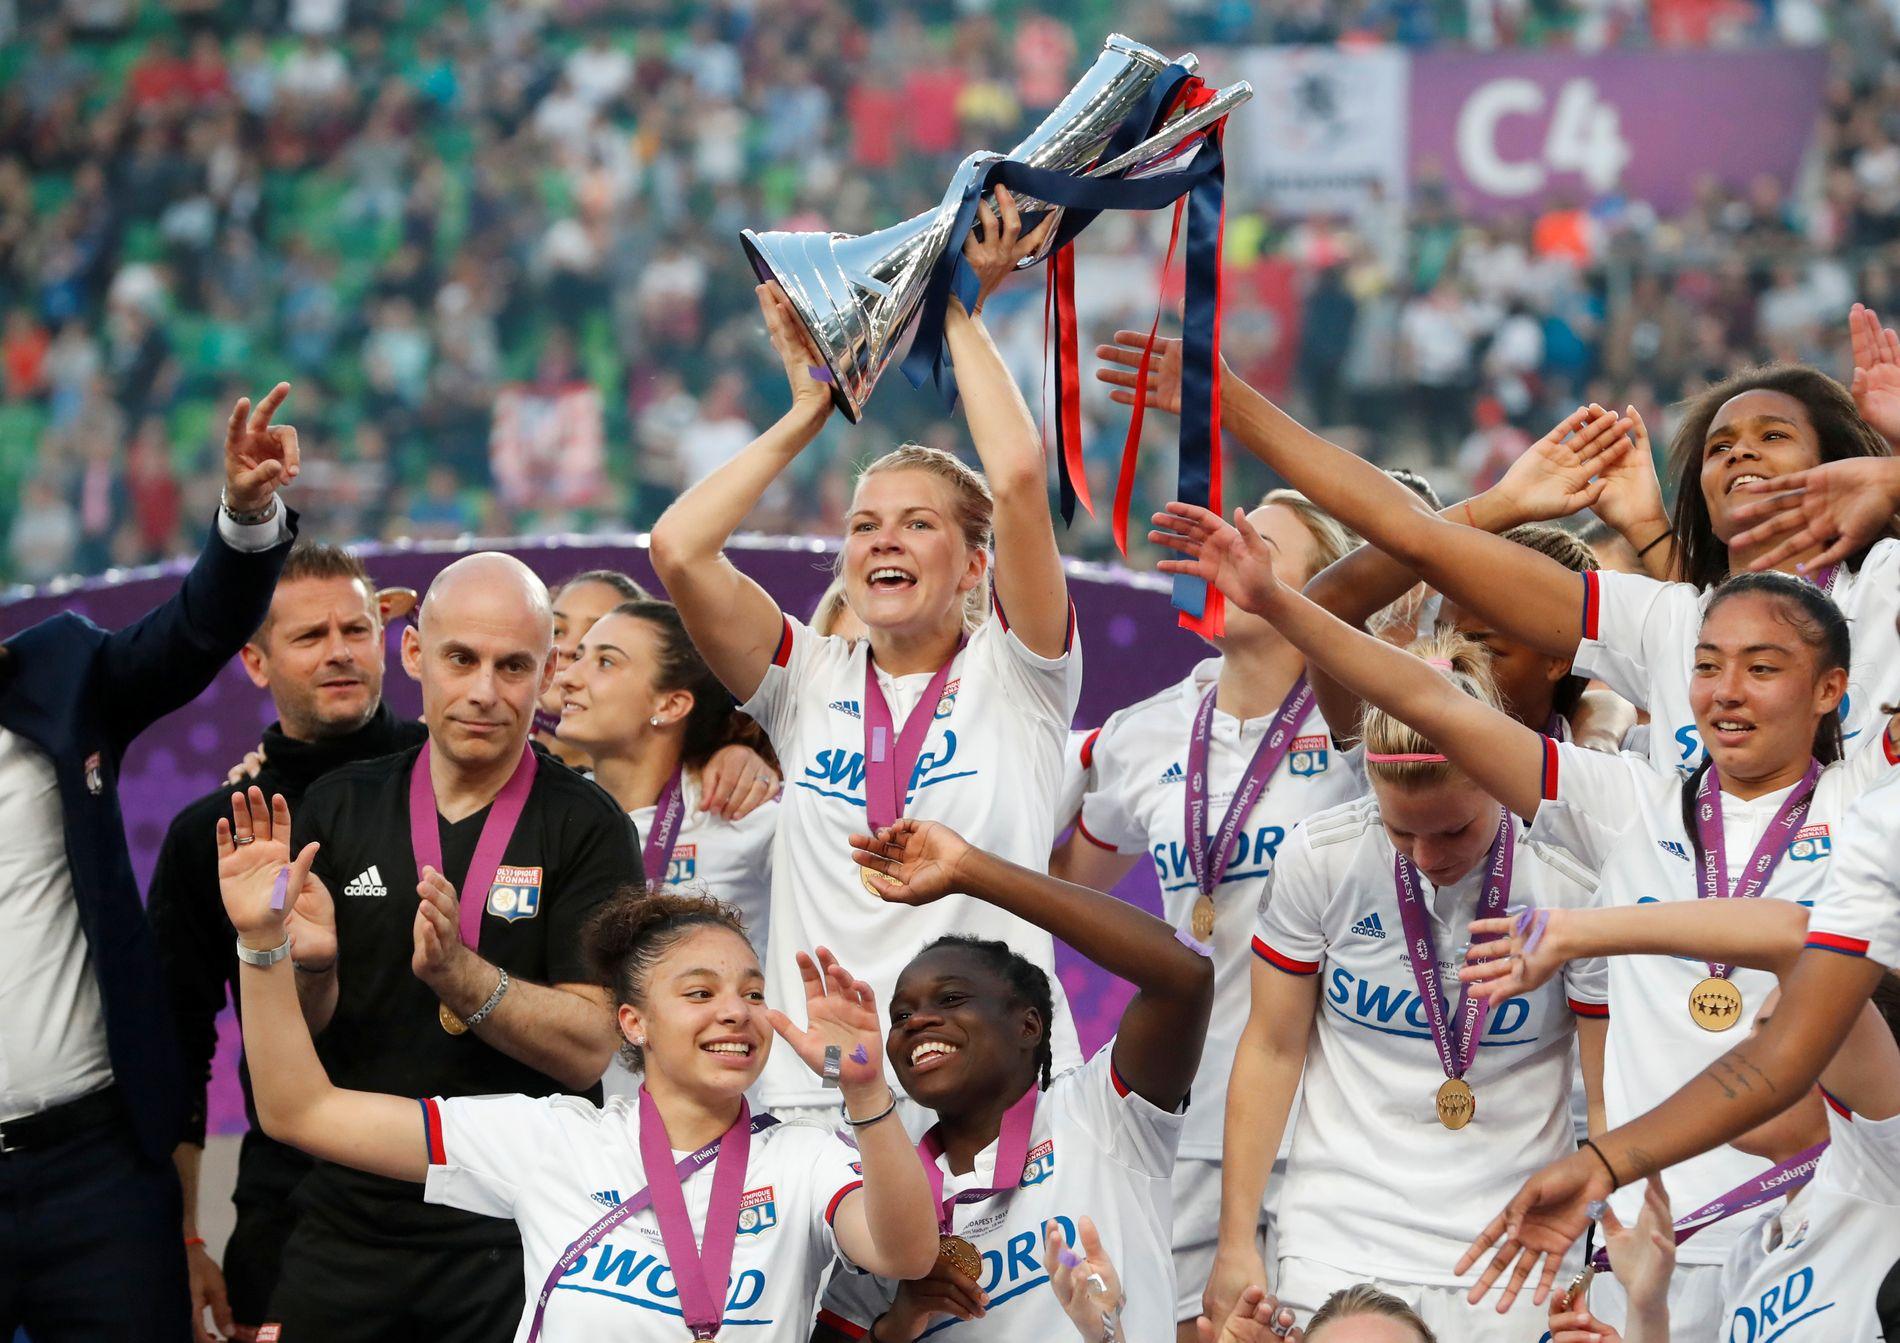 Får NFF godkjent en søknad om Champions League-finale, kan kanskje Ada Hegerberg løfte trofeet på Ullevaal i 2023.